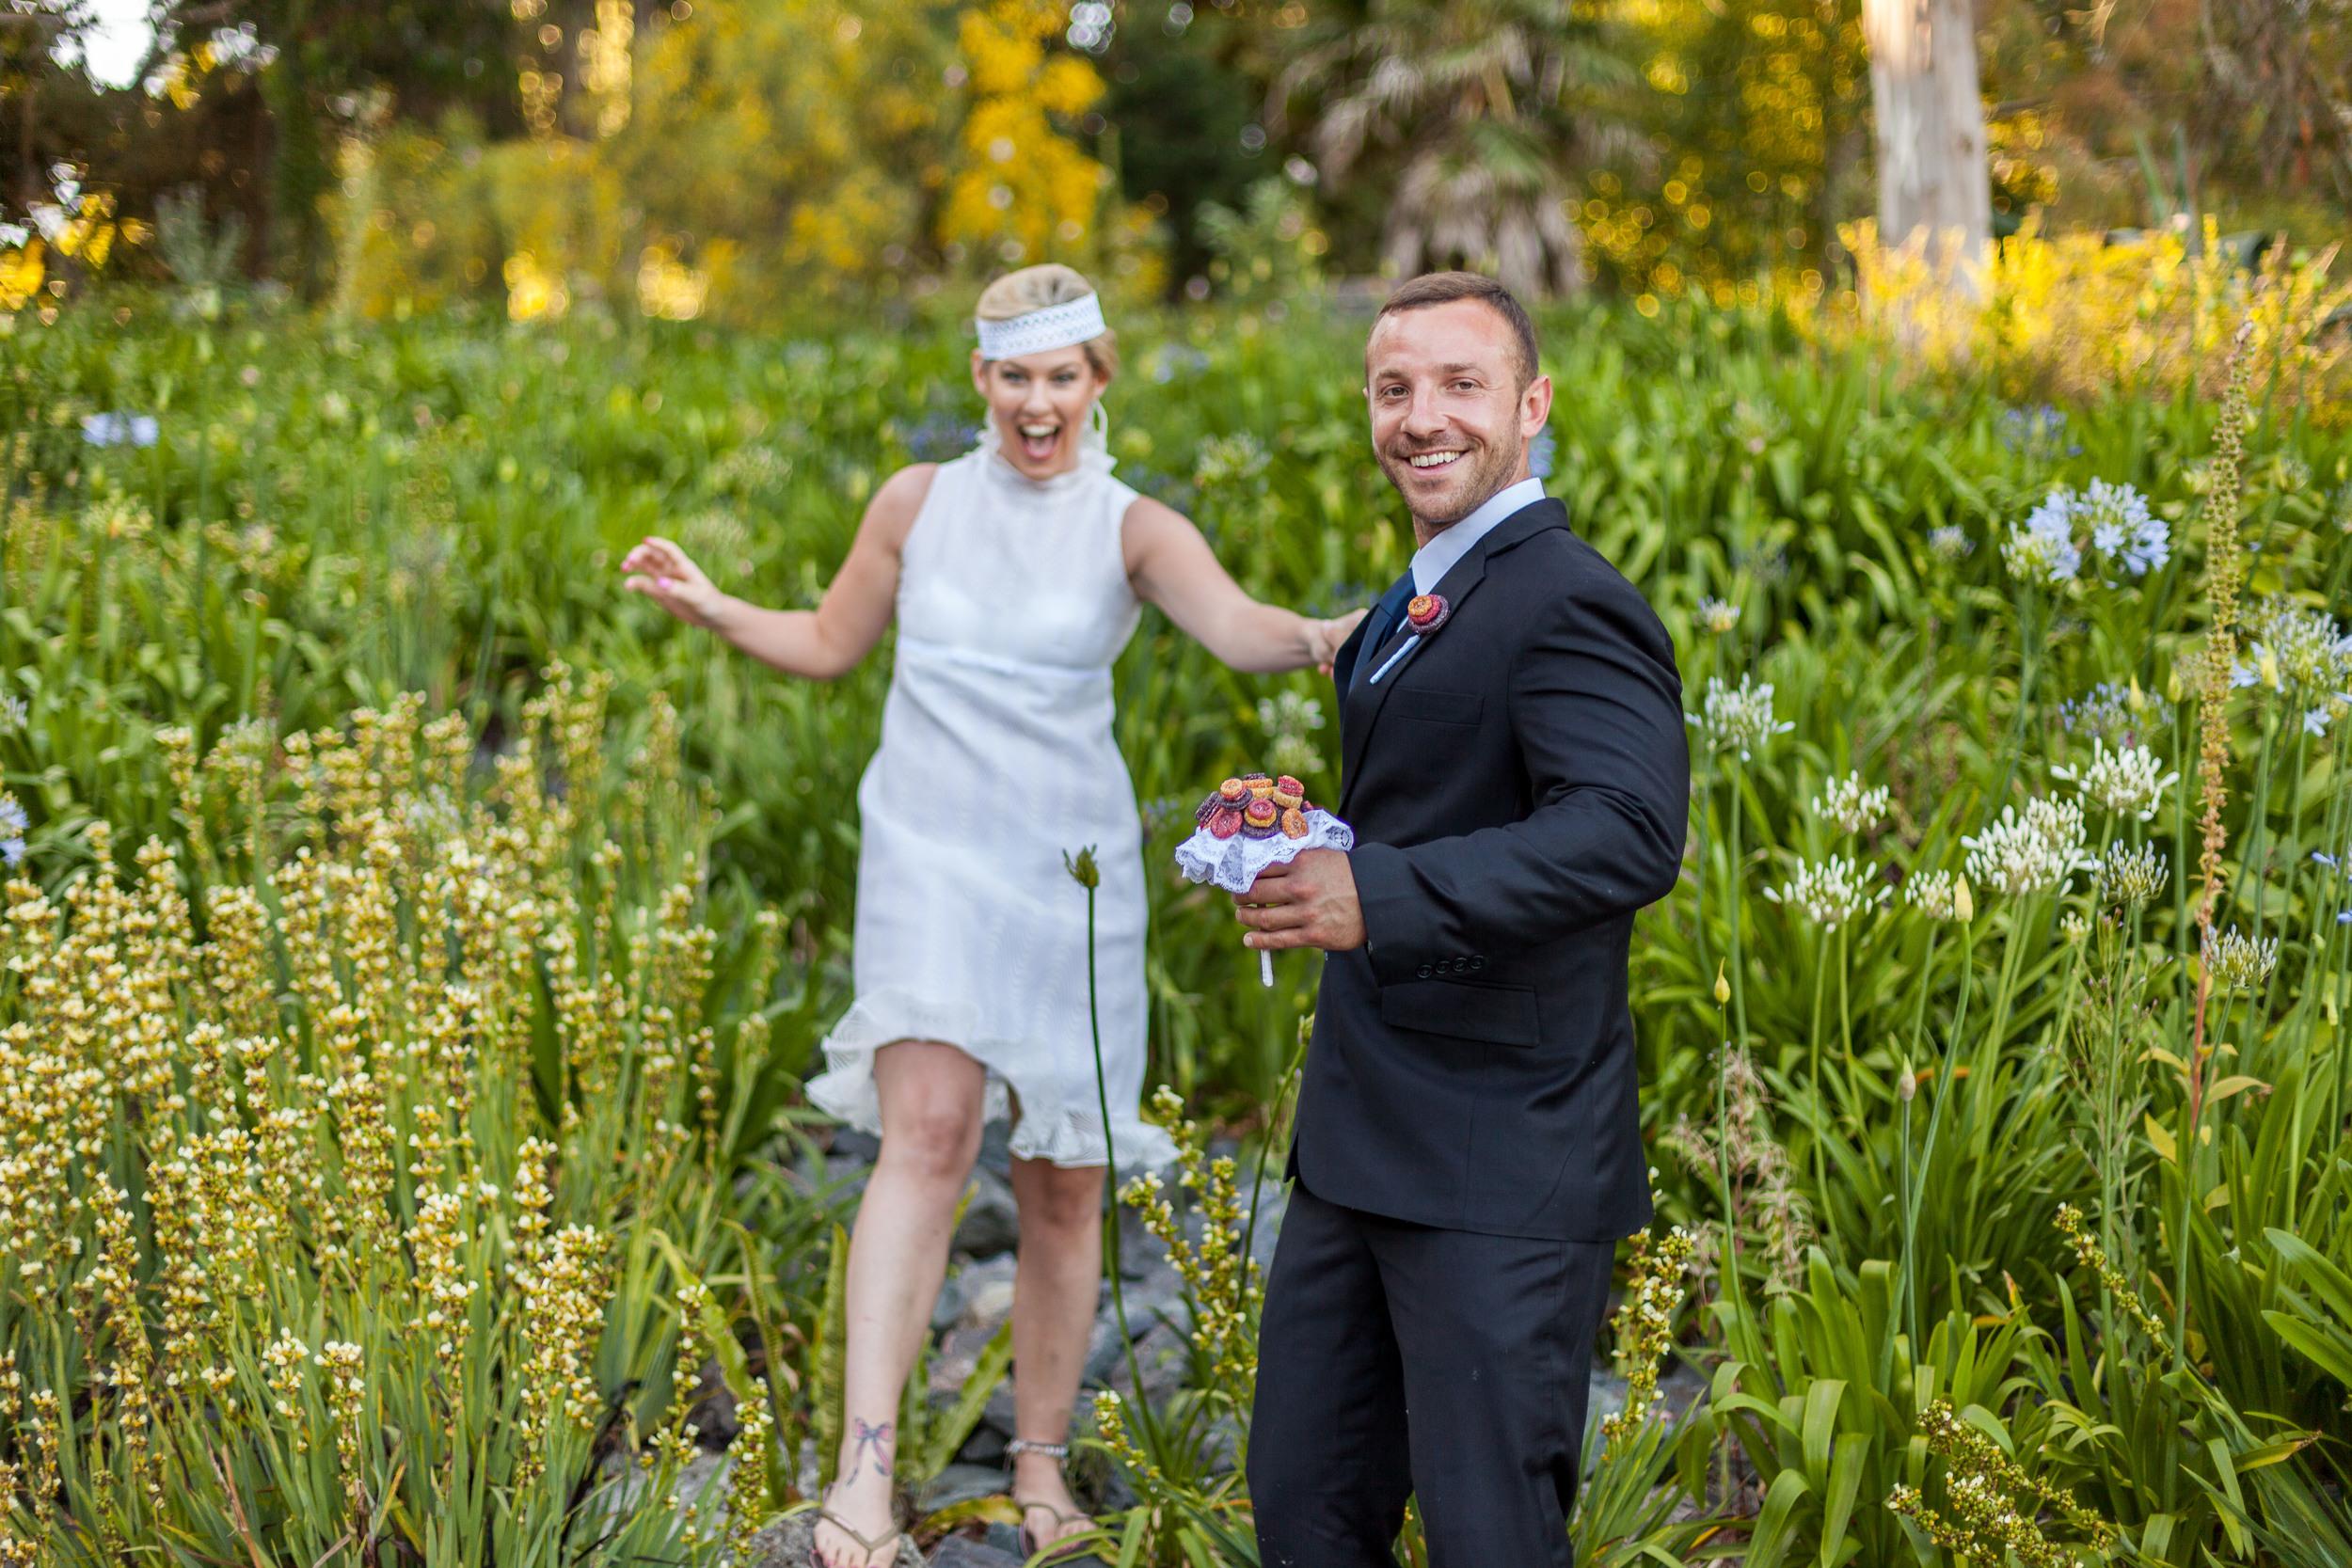 ethical-wedding-VBG-chris-cowley-204.jpg